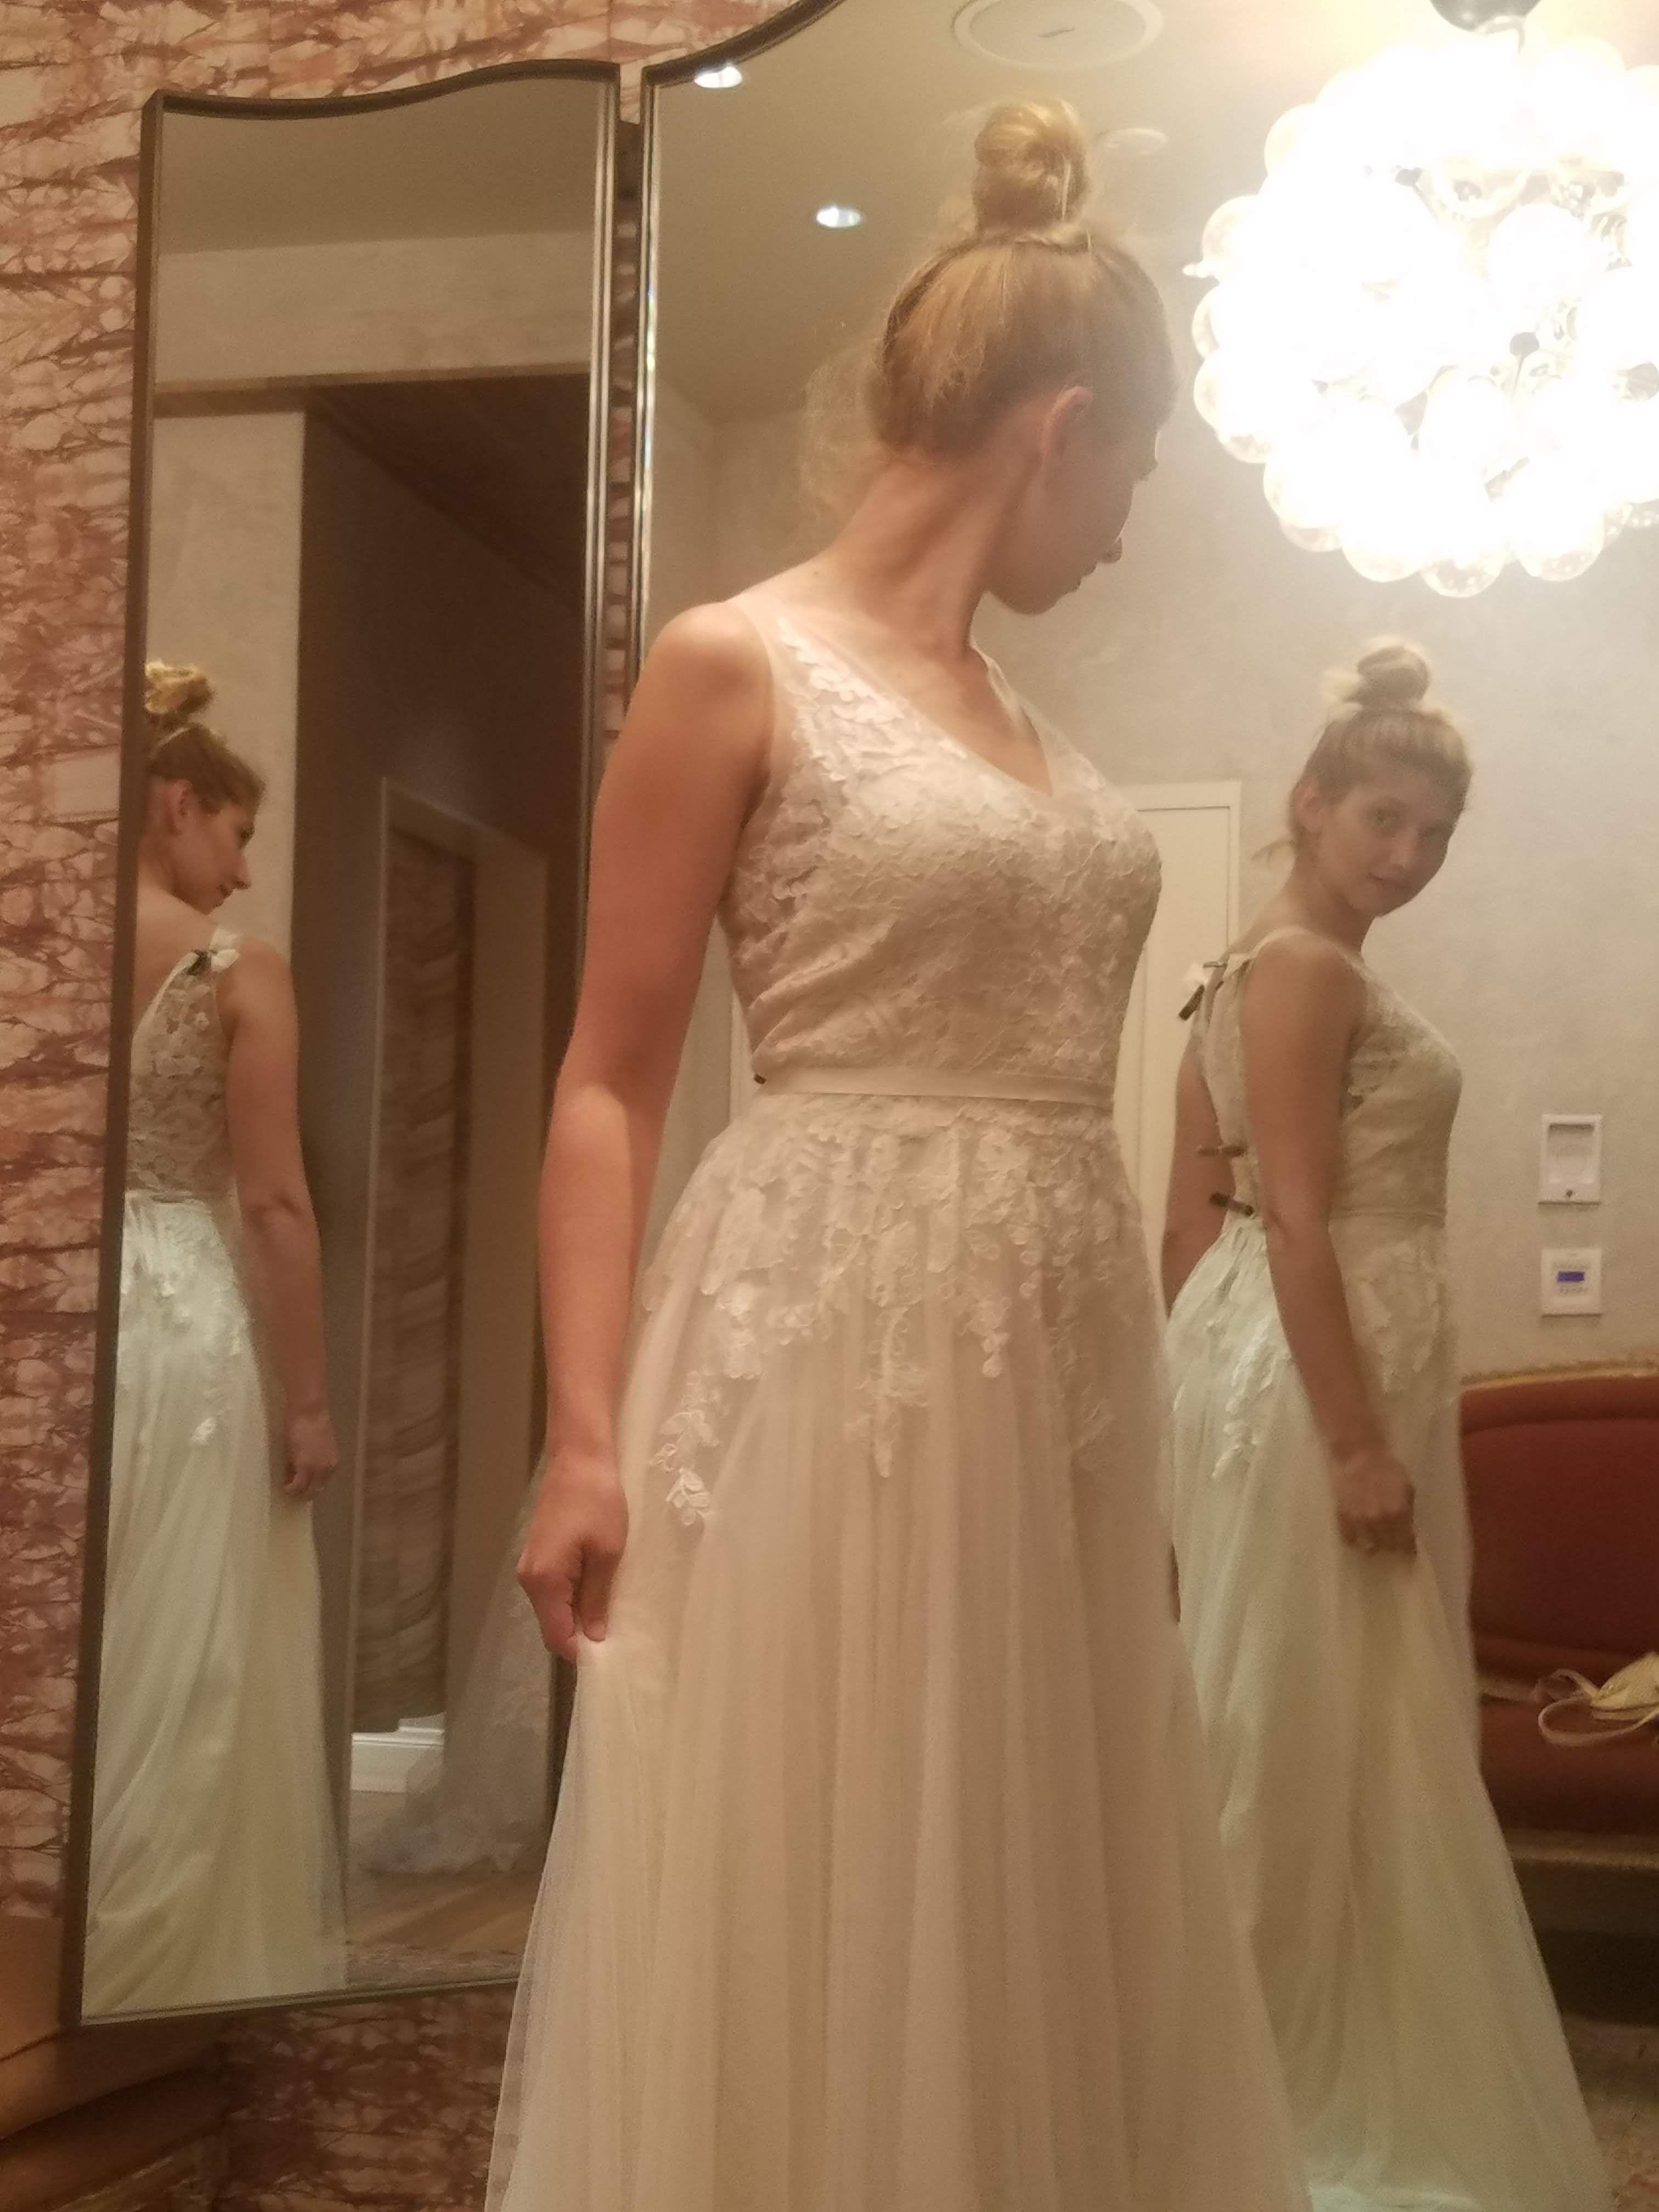 Pin by Gina Gianni on My beach wedding in 2020 Wedding